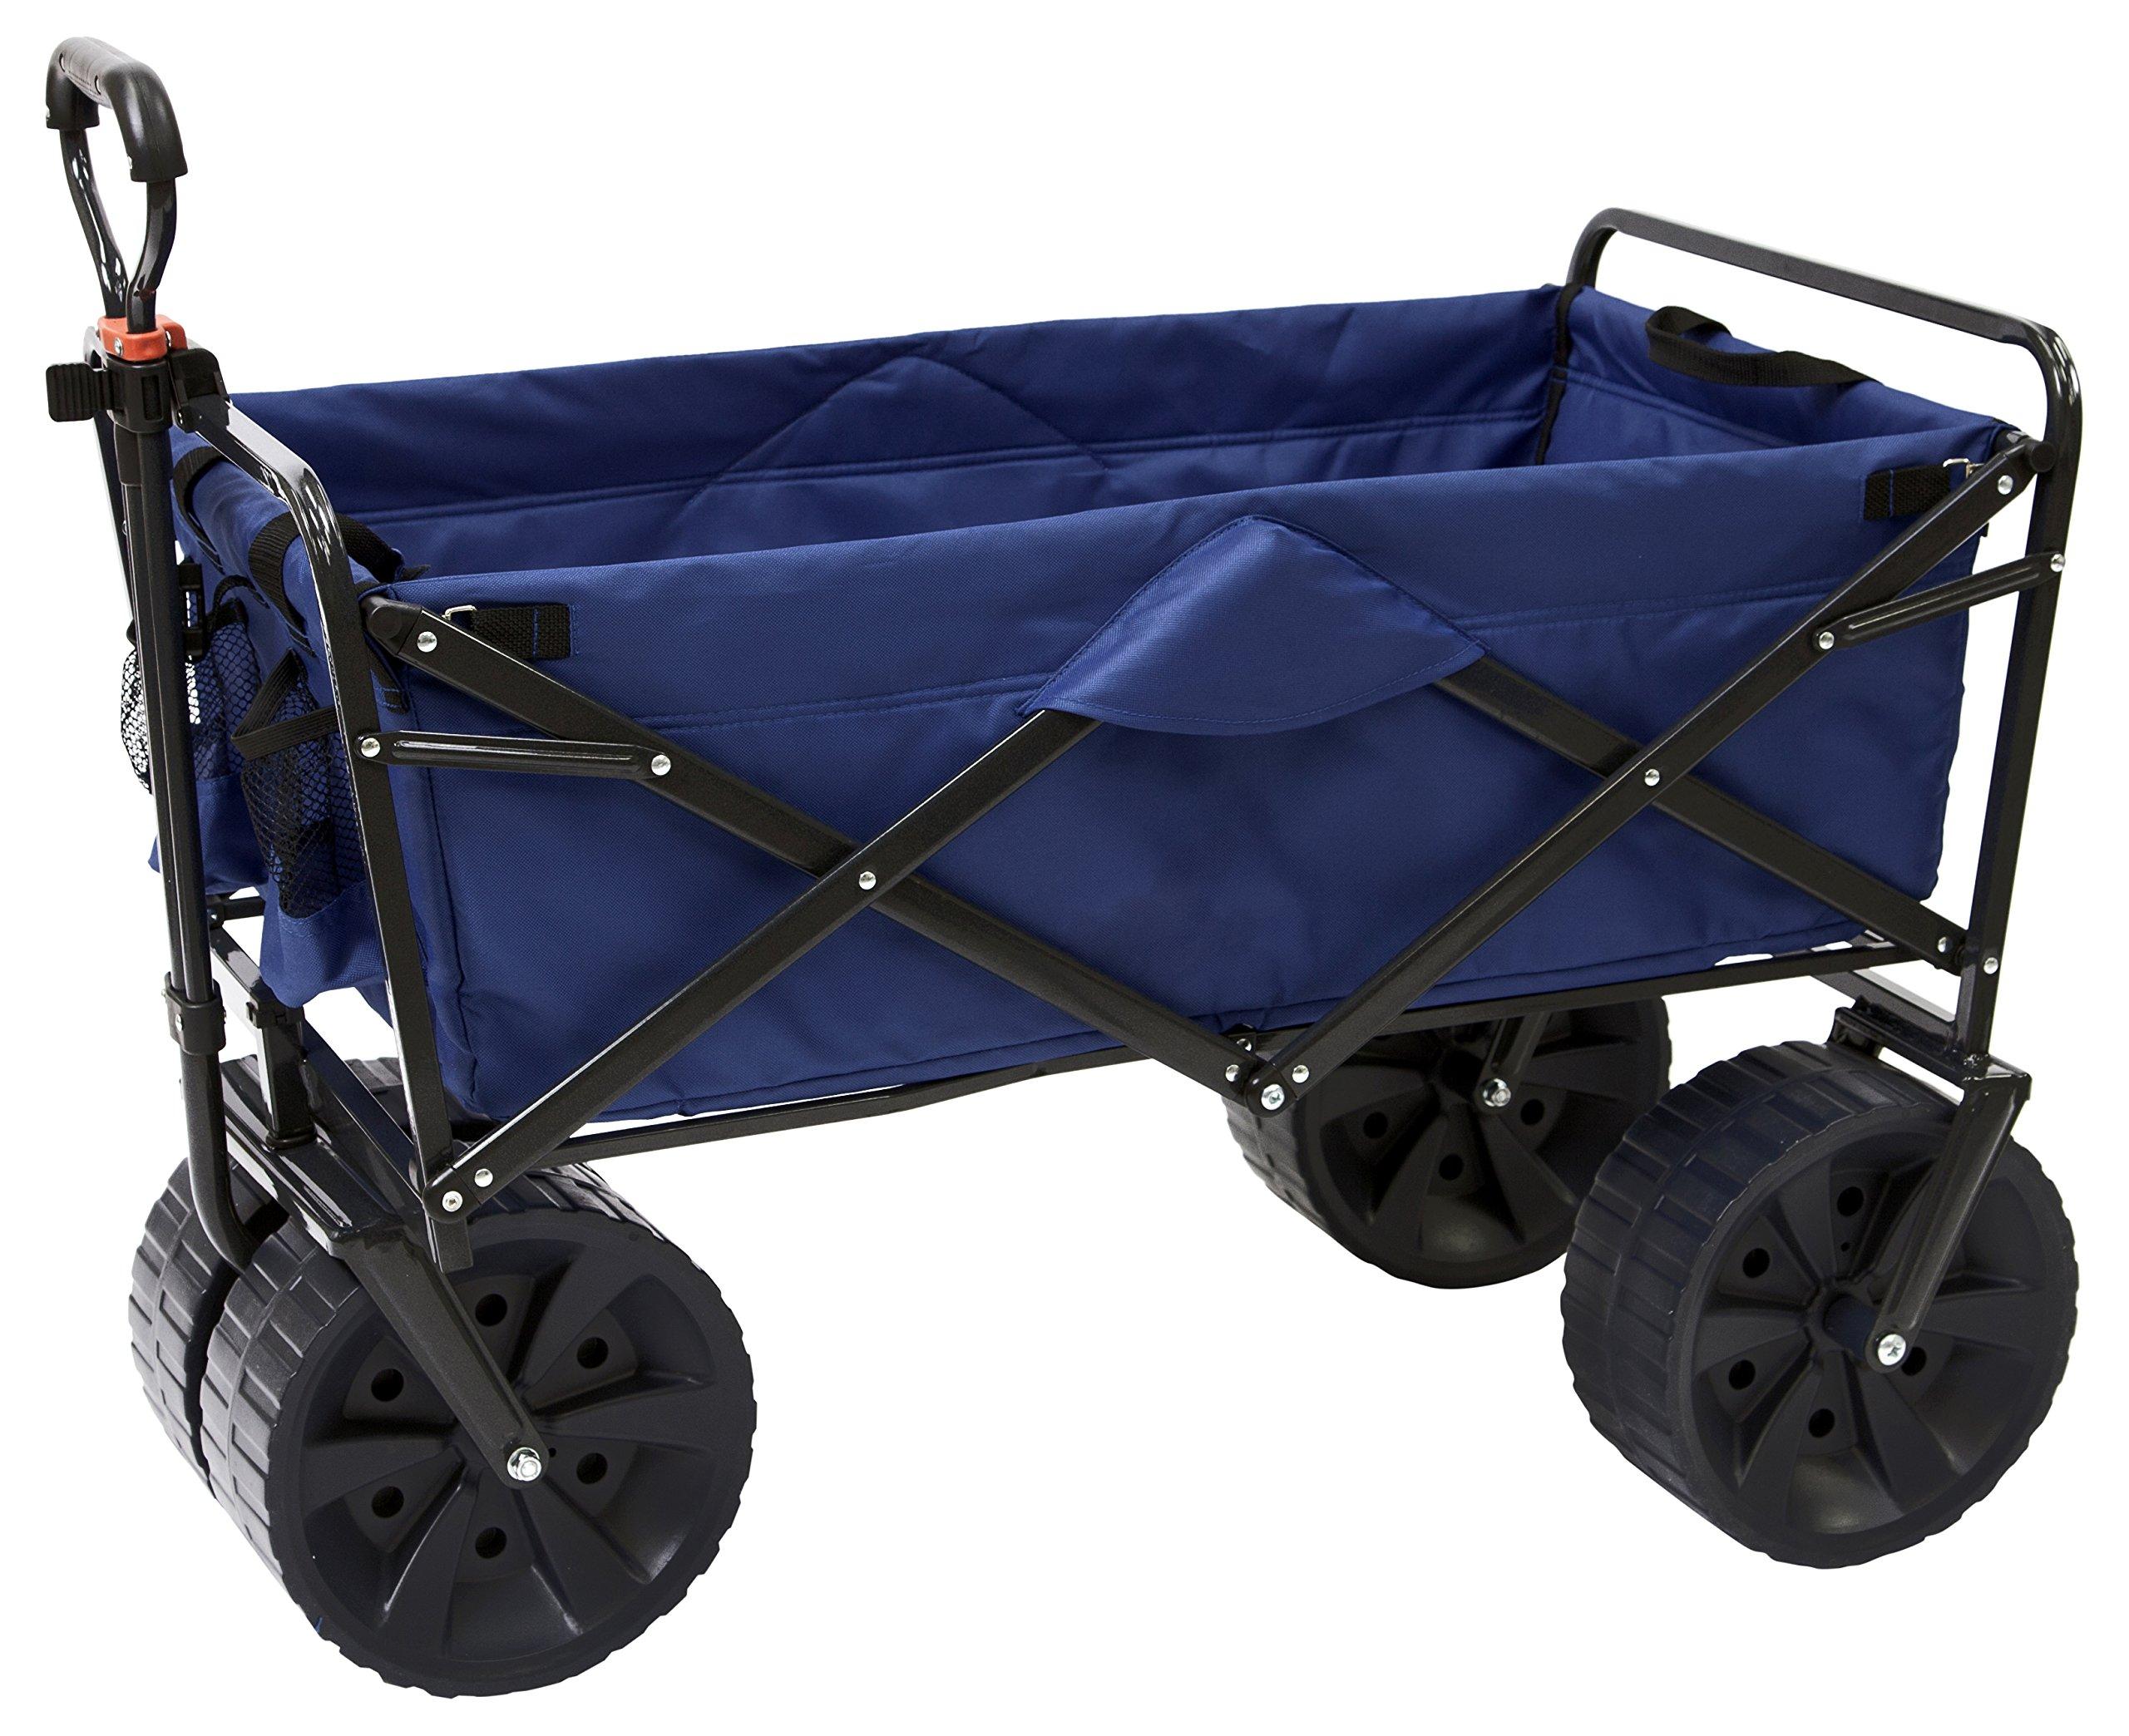 Mac Sports Heavy Duty Collapsible Folding All Terrain Utility Beach Wagon Cart Blue Black In Price On M Alibaba